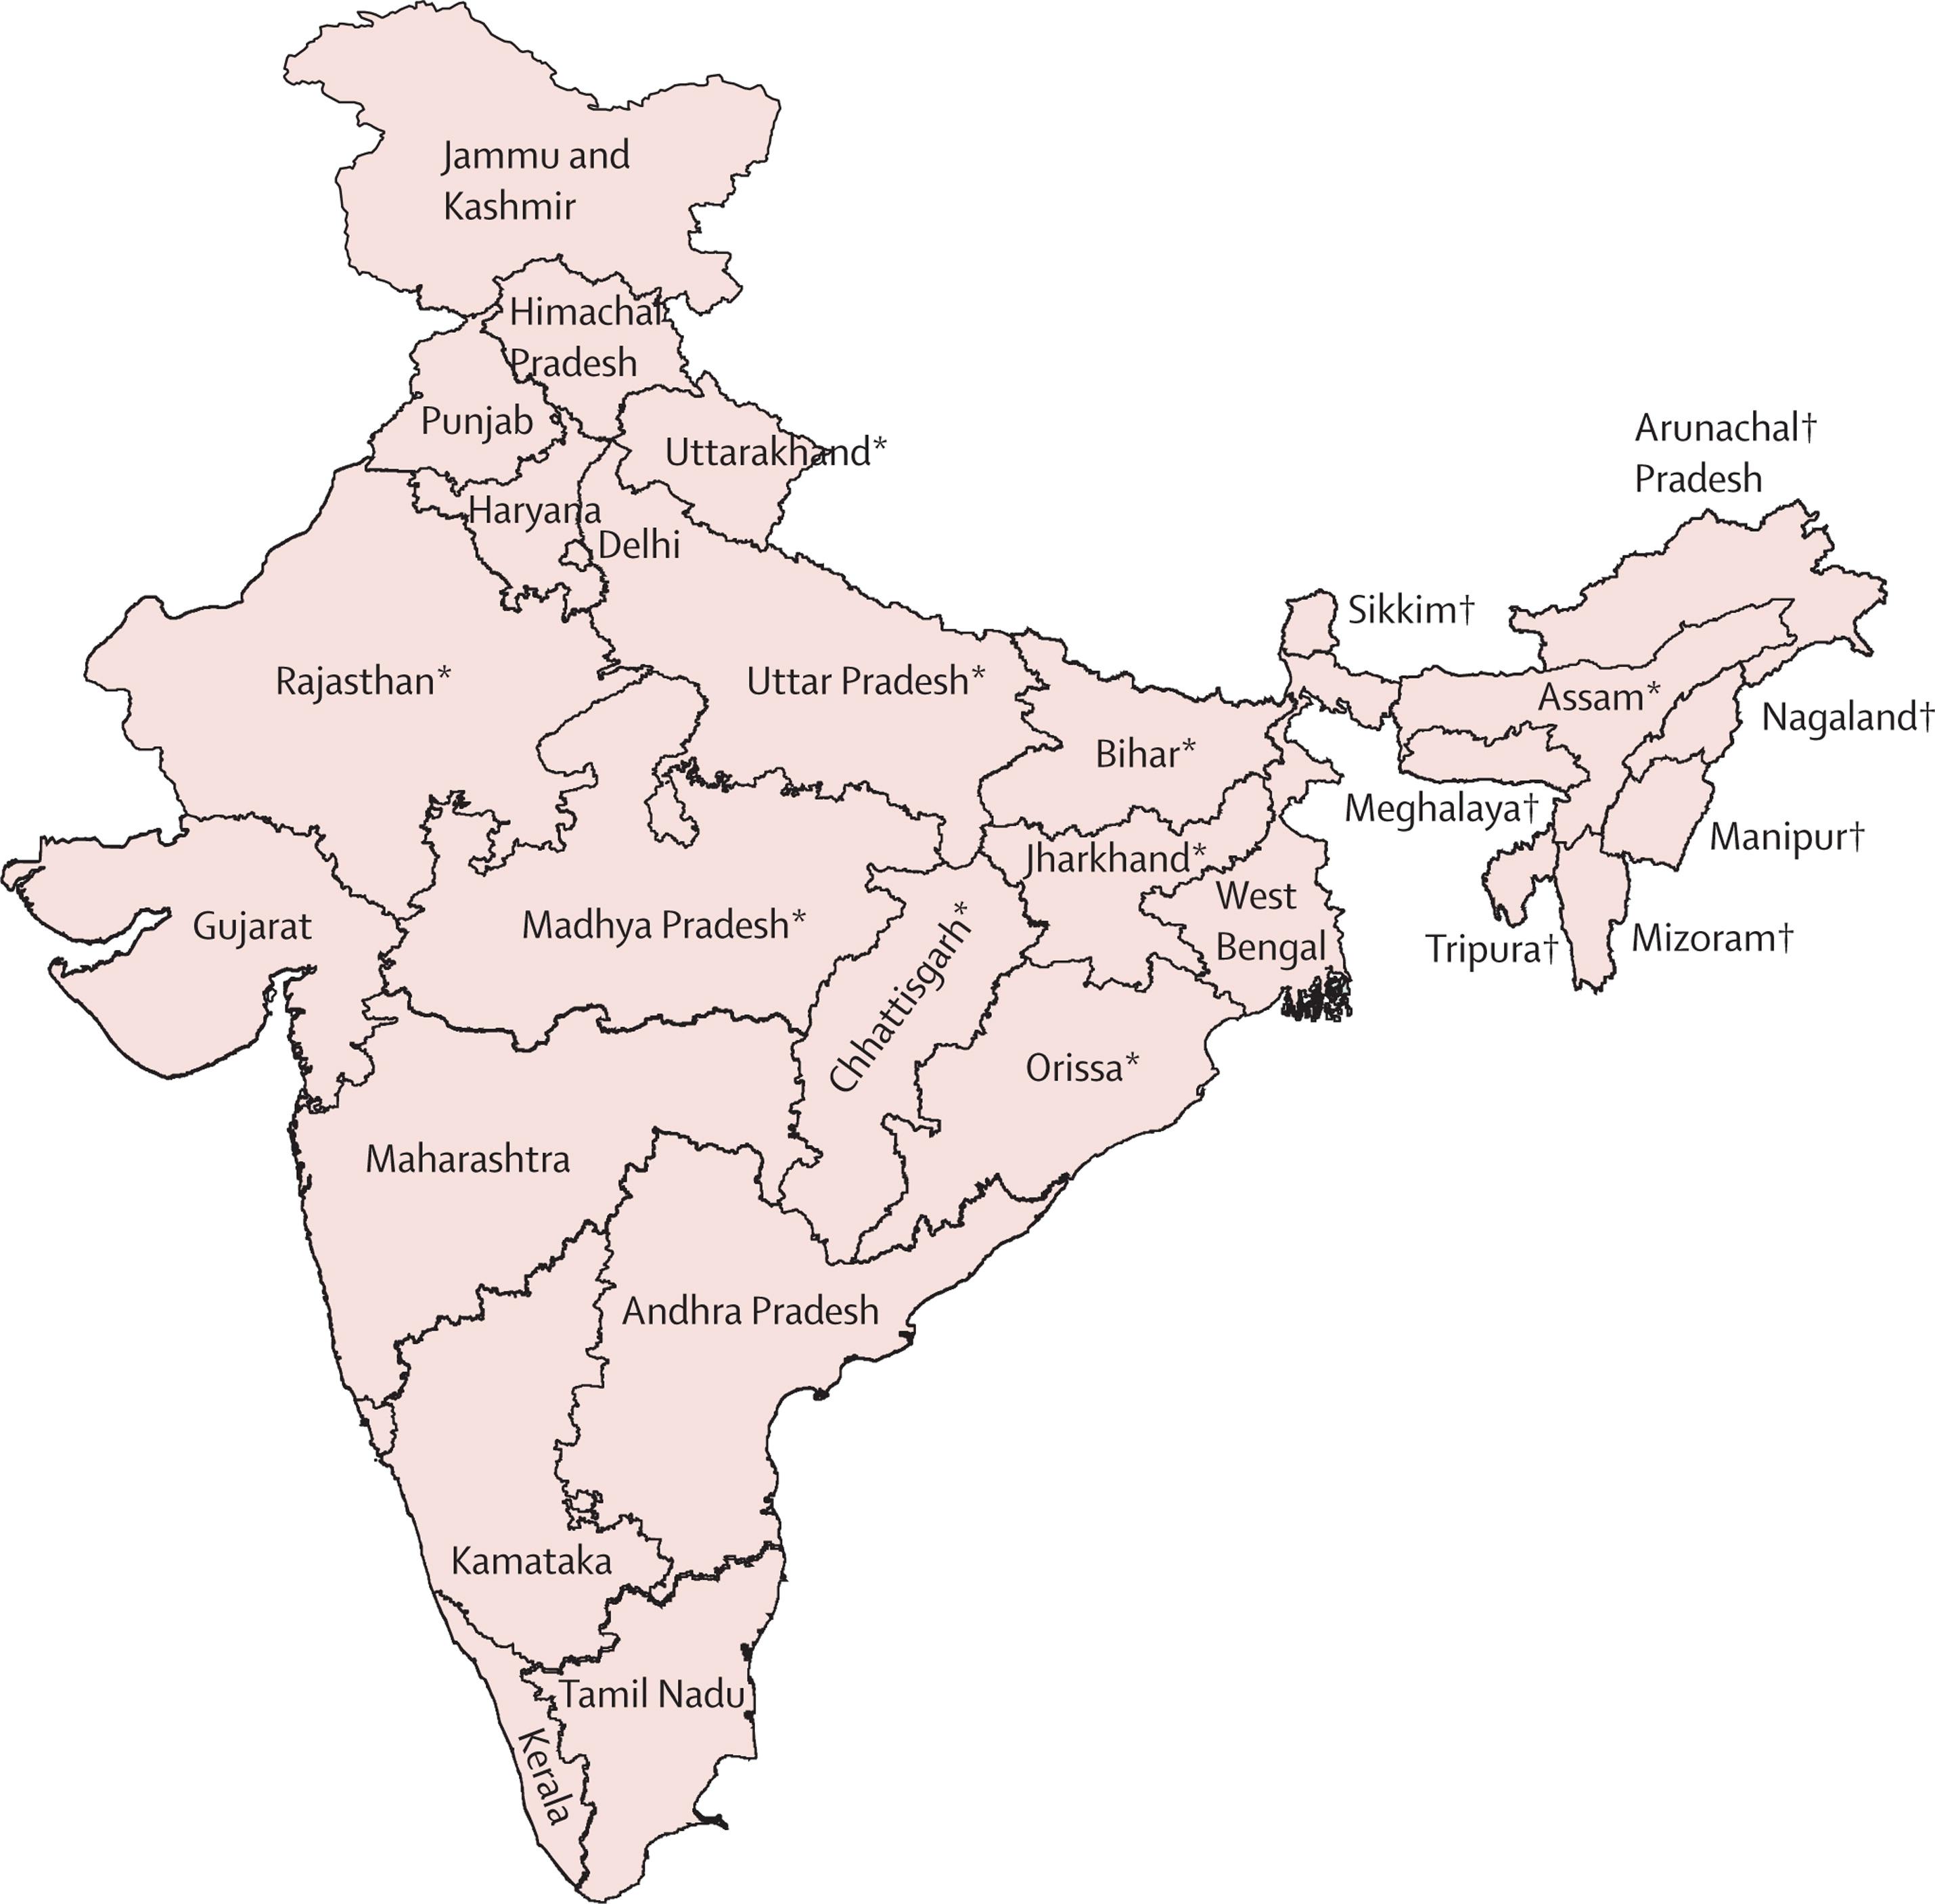 Cancer Mortality In India A Nationally Representative